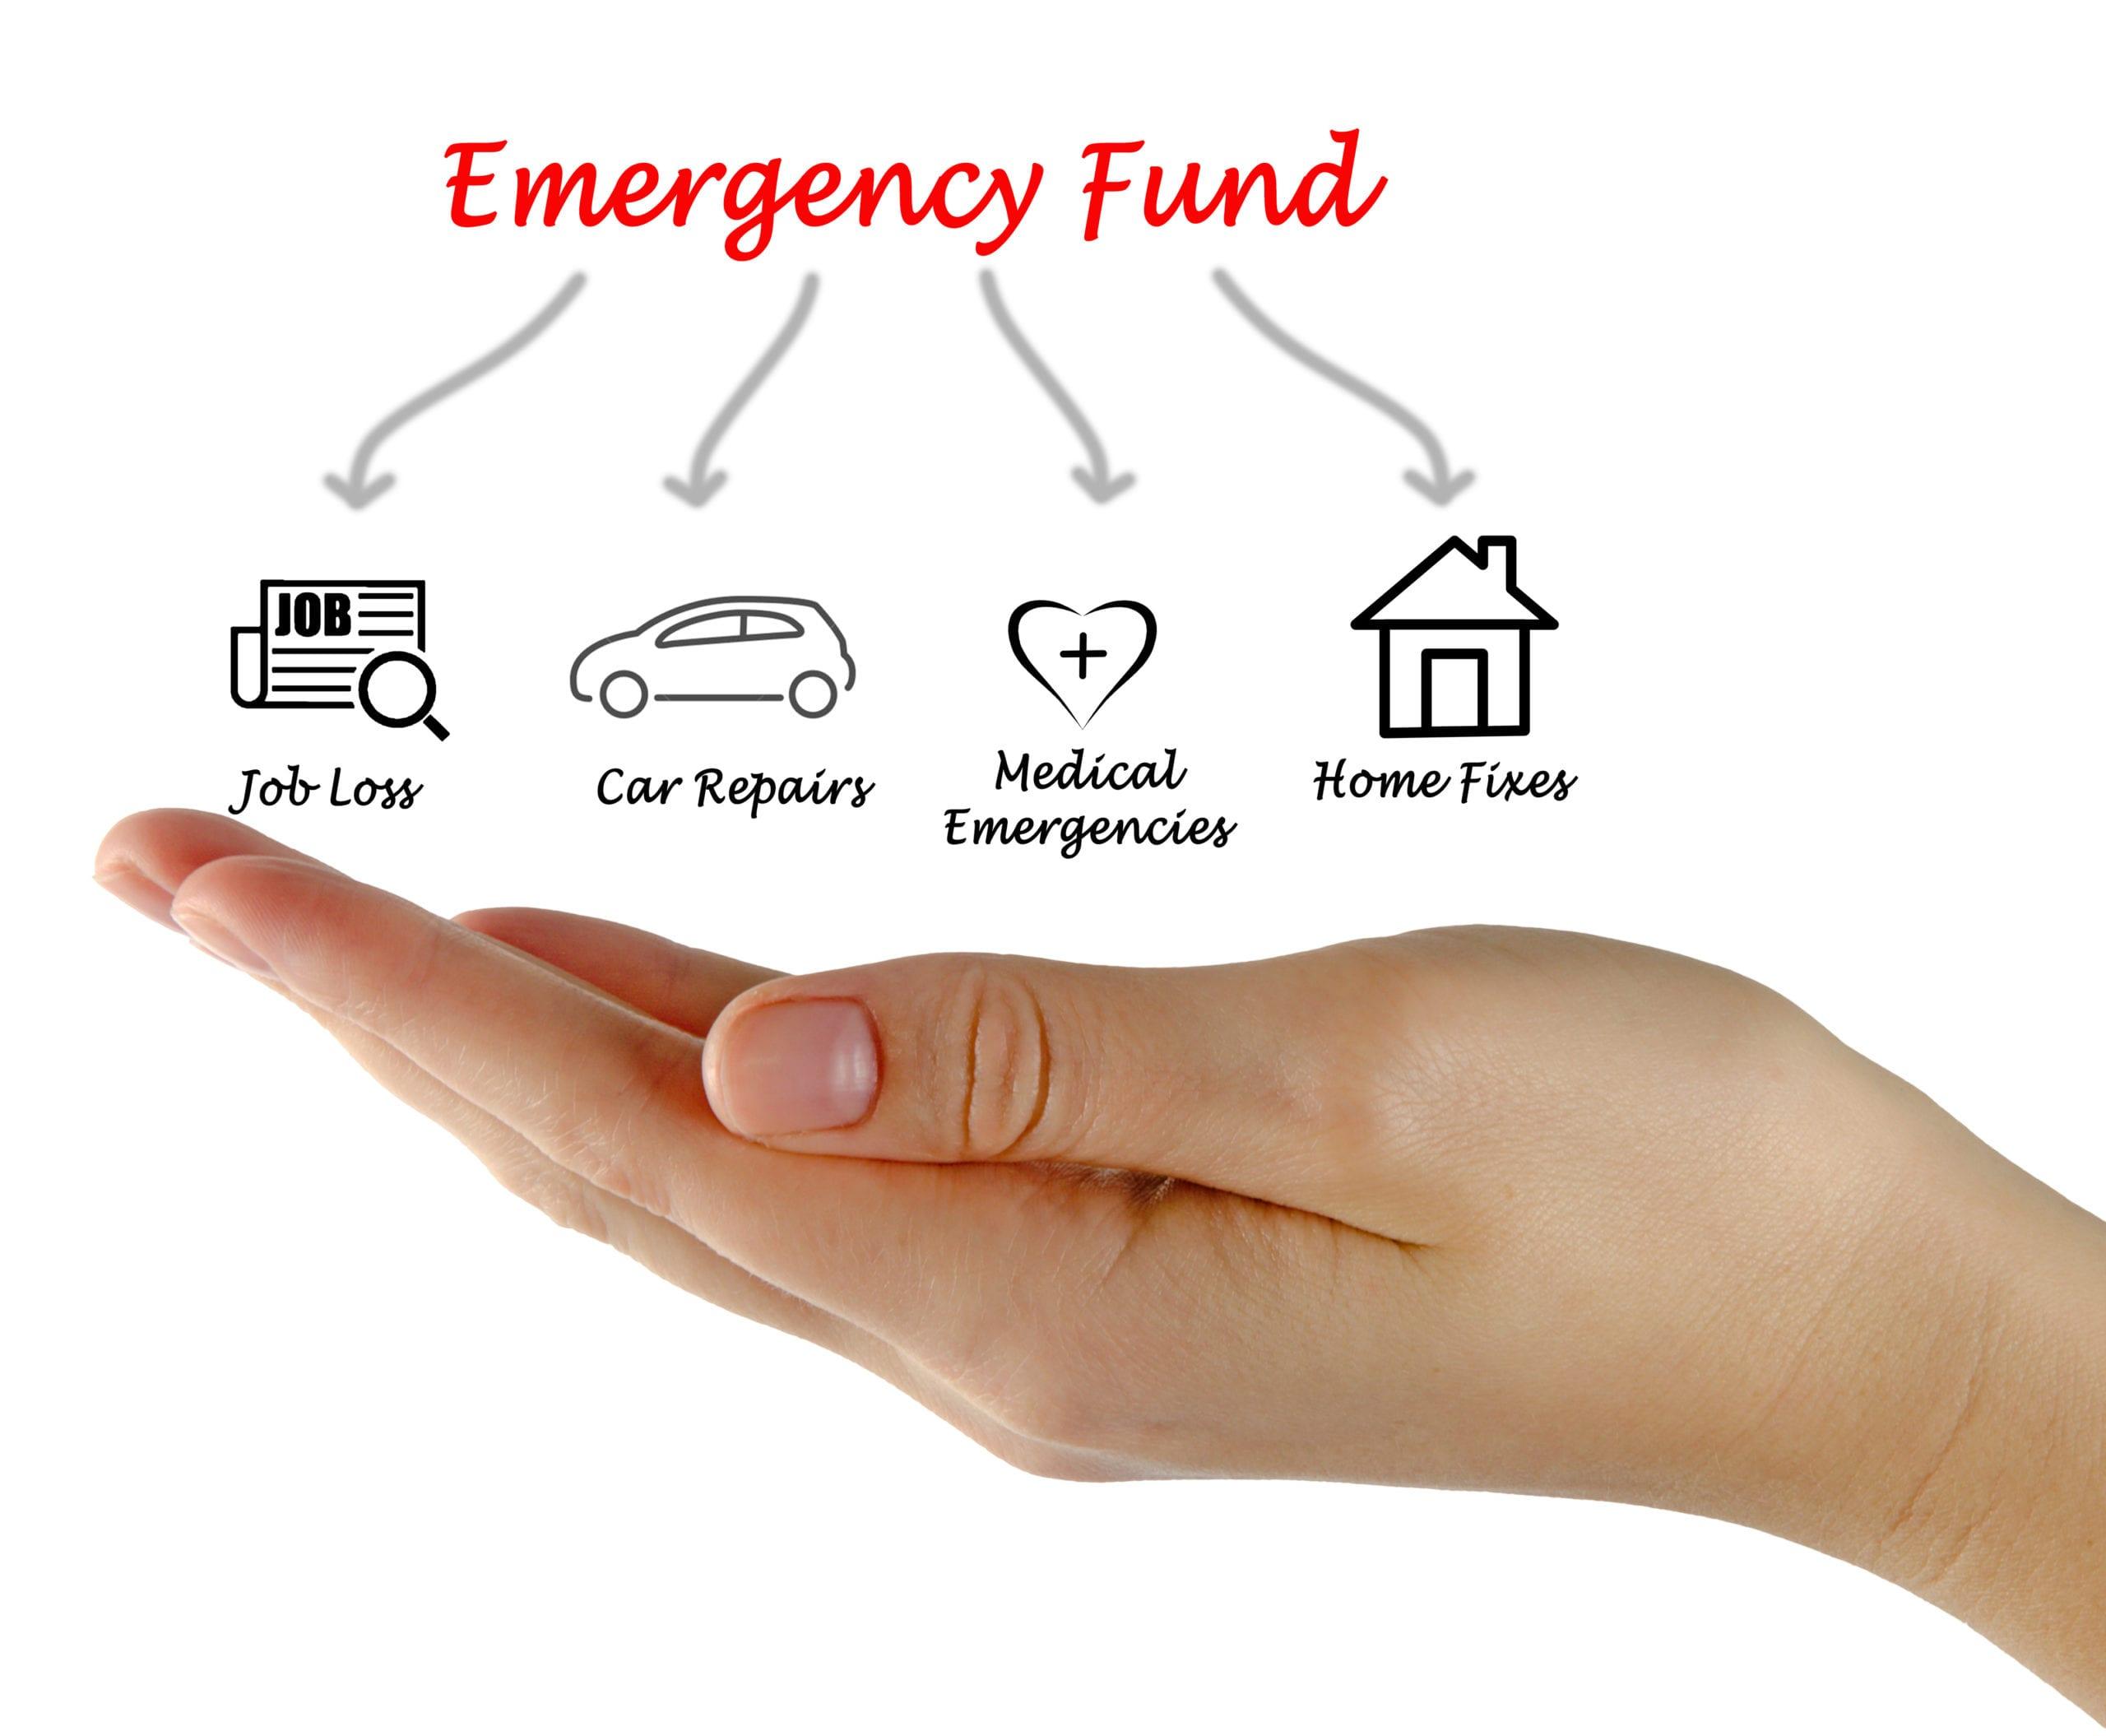 emergency Fund. Why you need an emergency fund. How to start an emergency fund. Emergency fund 2020. rainy day fund.